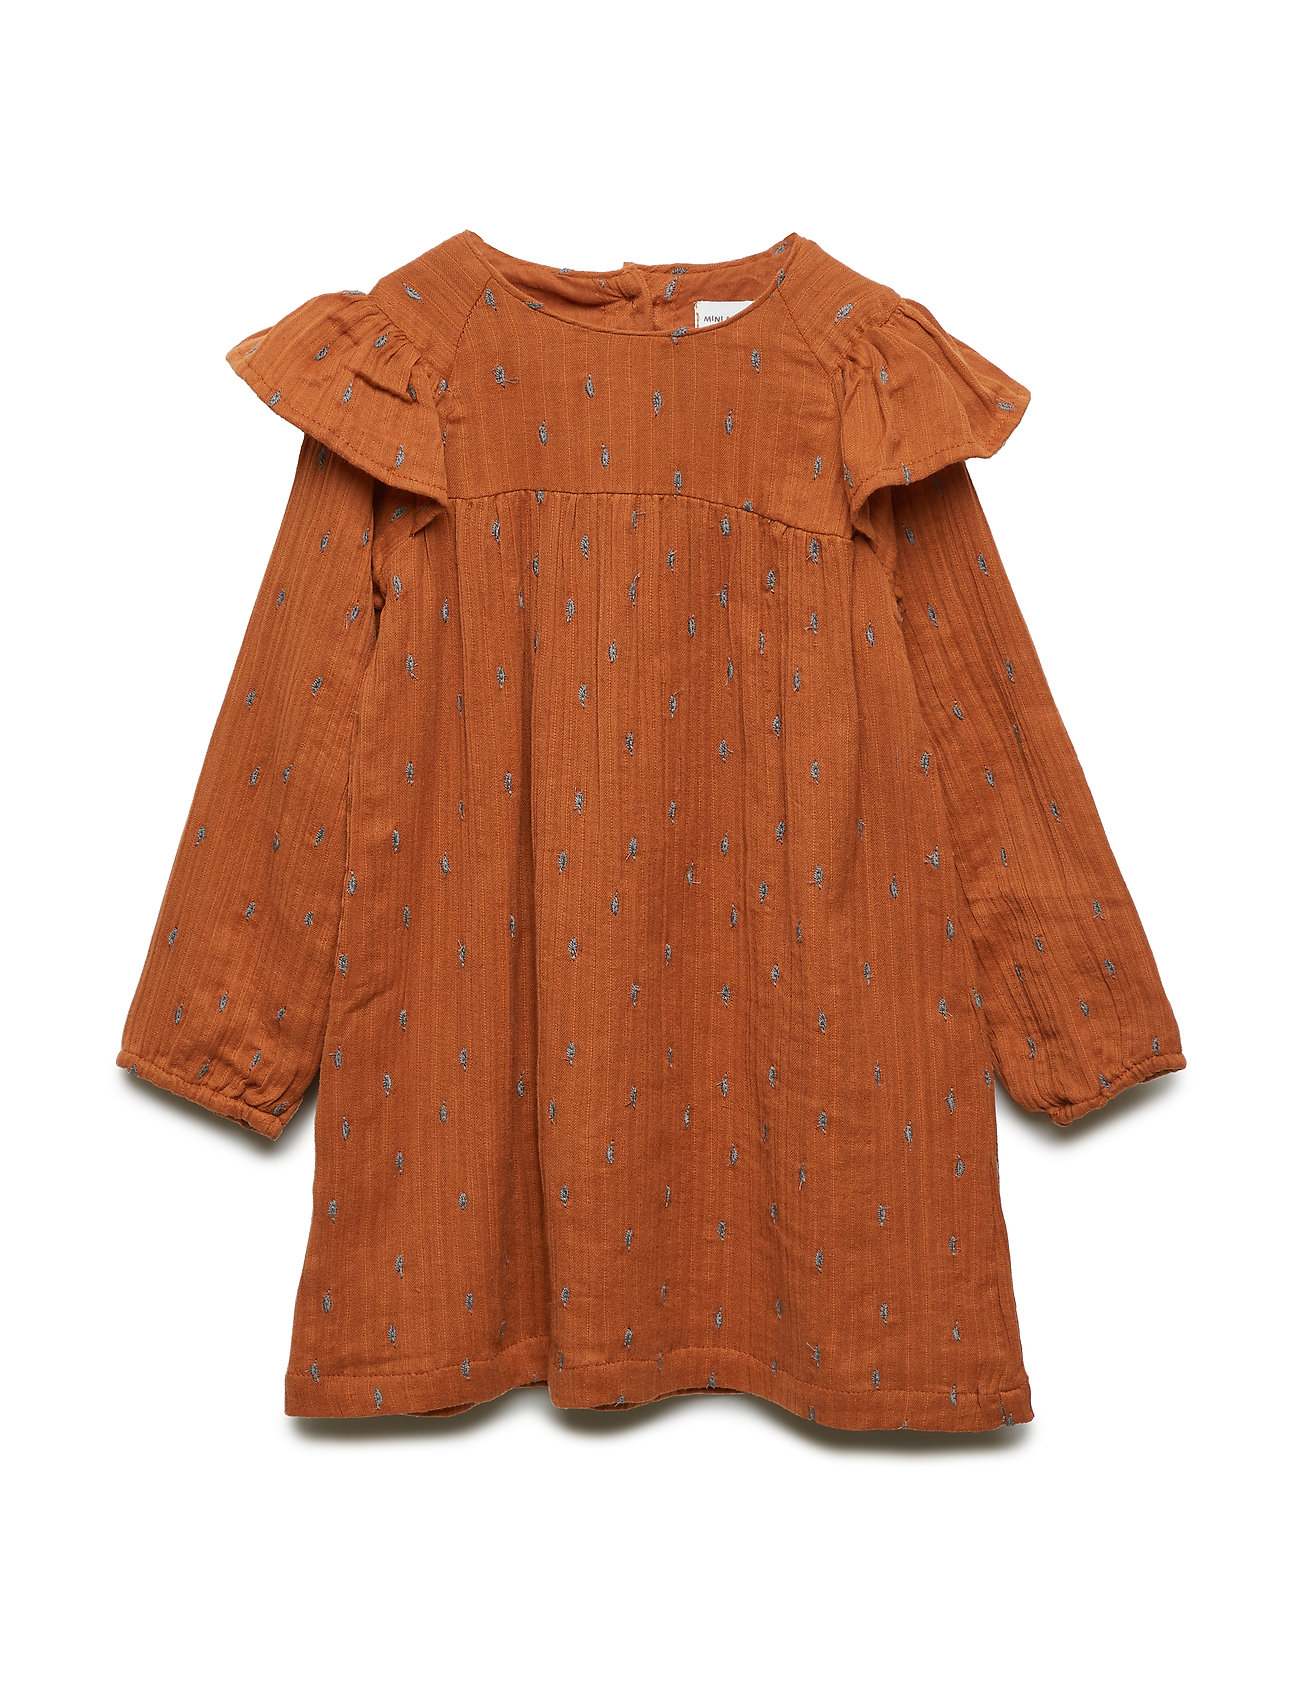 Mini A Ture Ammalie Dress, M - LEATHER BROWN